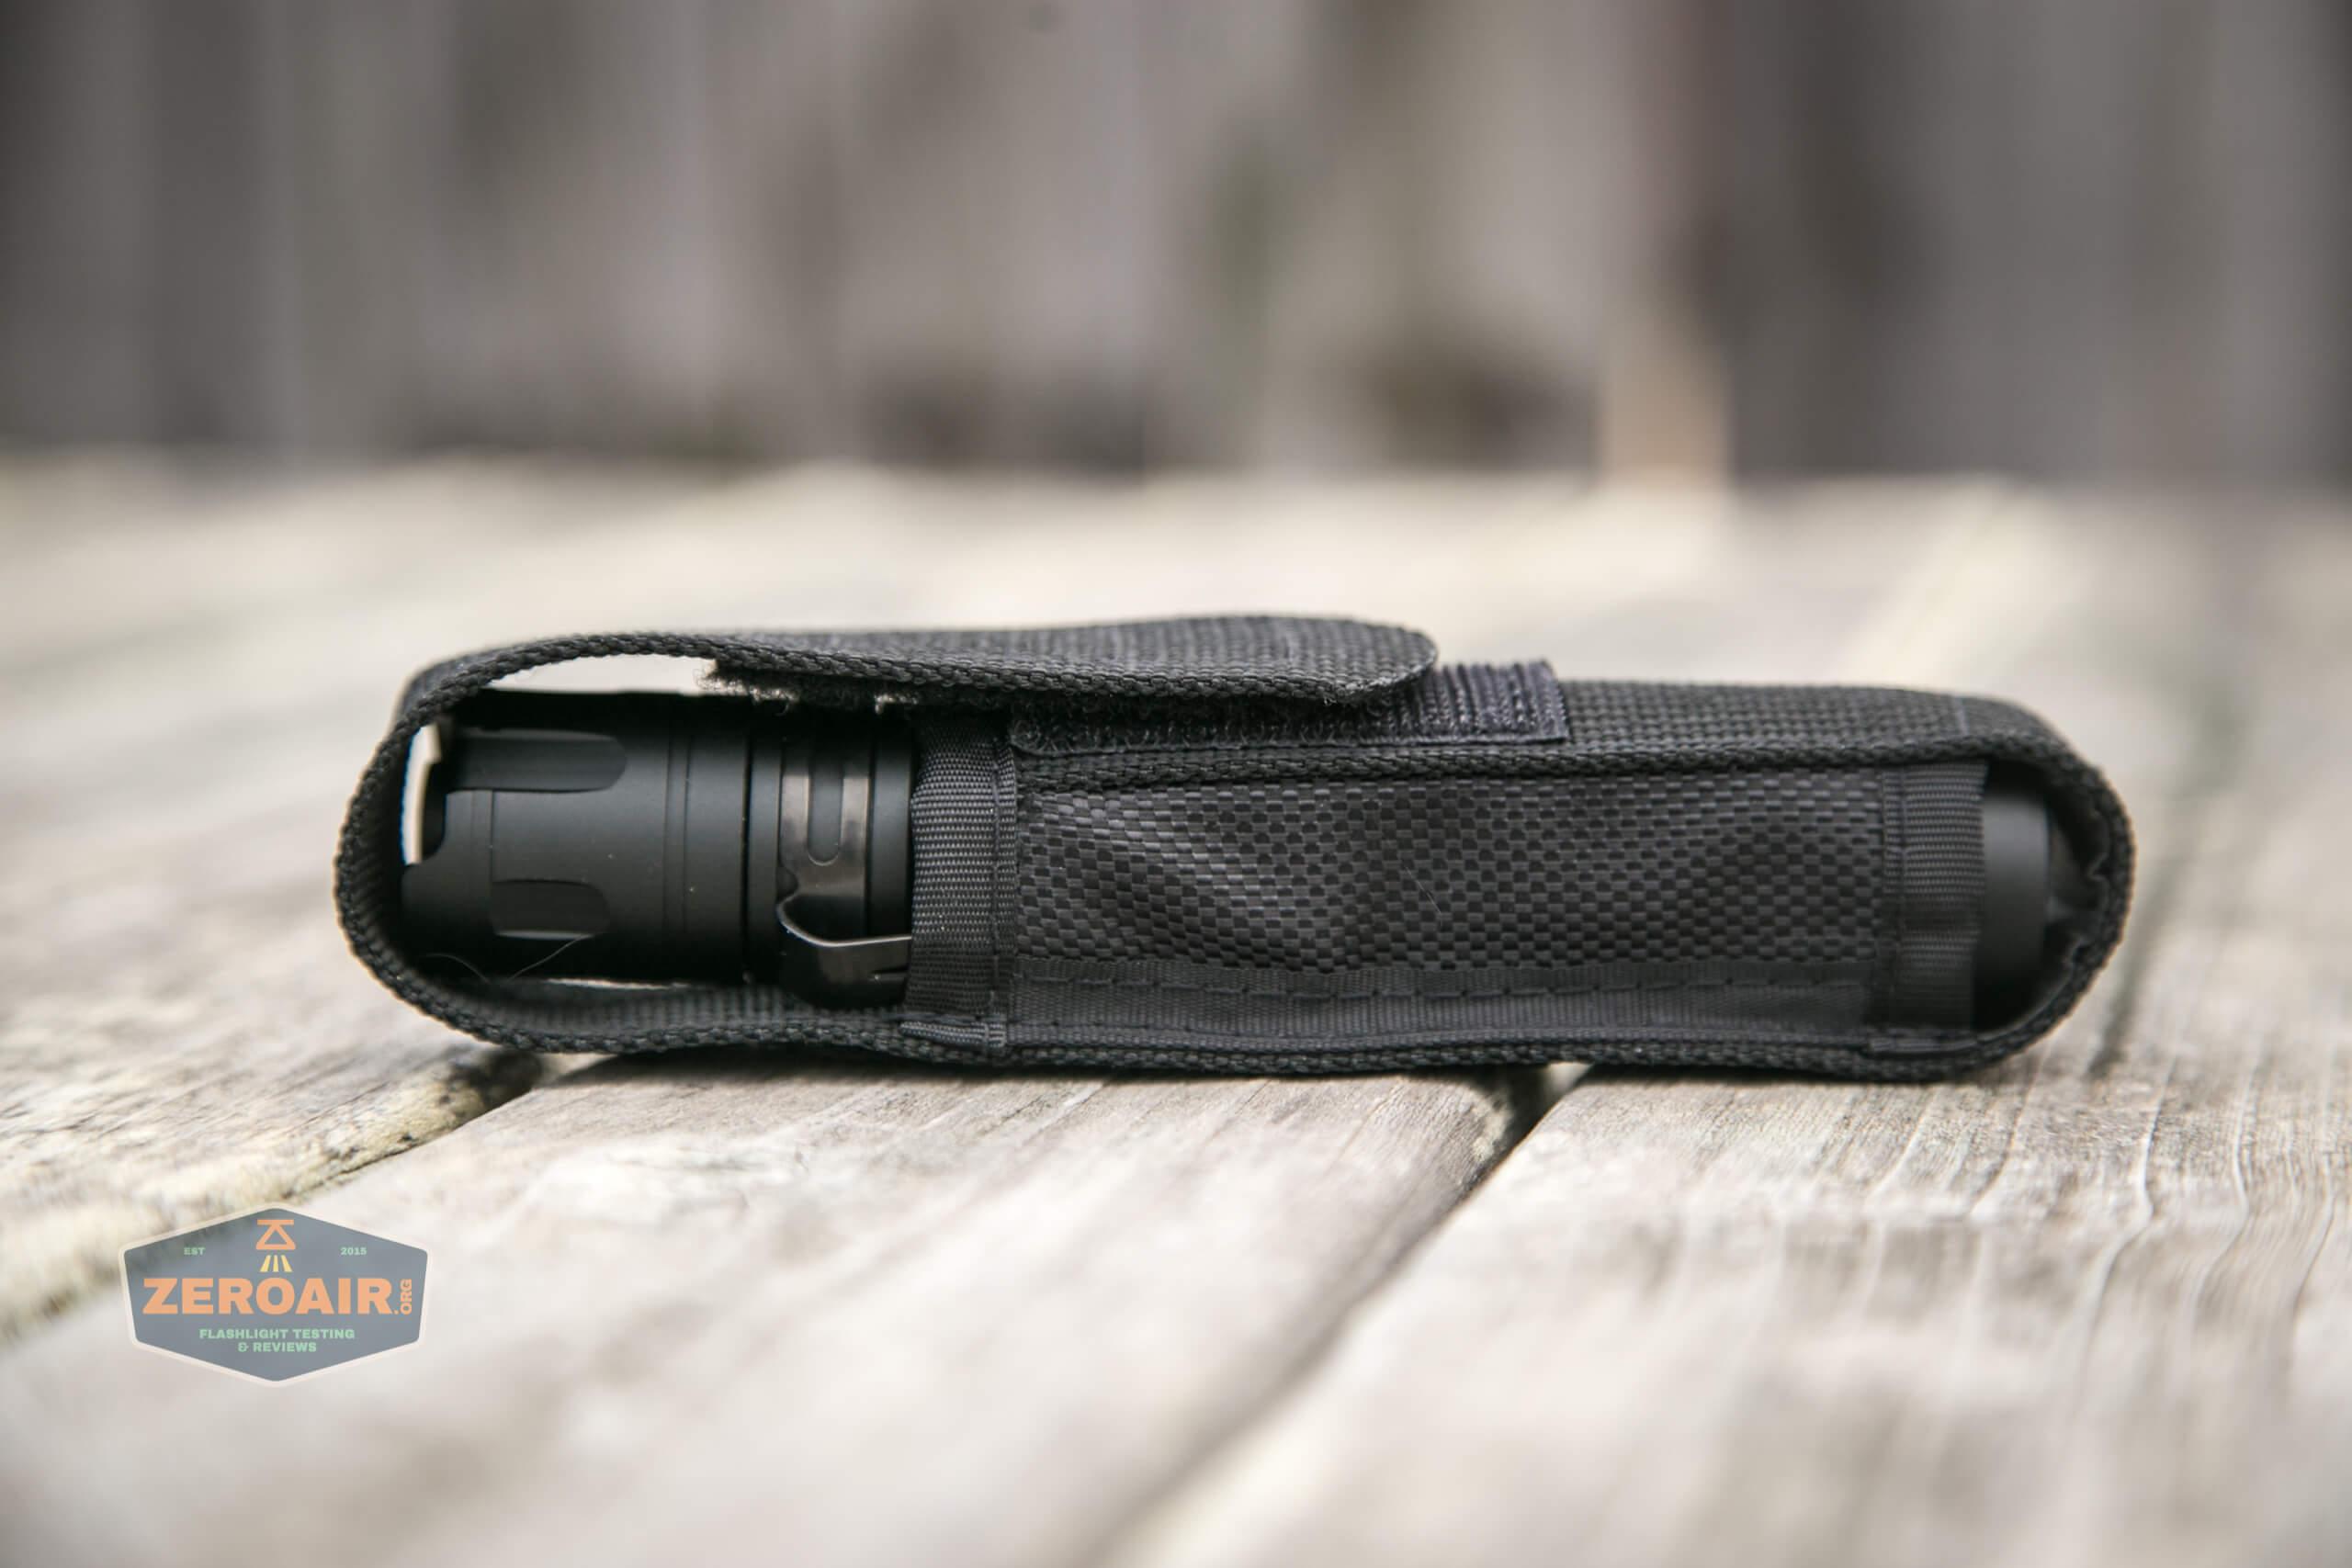 Cyansky P25 Flashlight nylon pouch